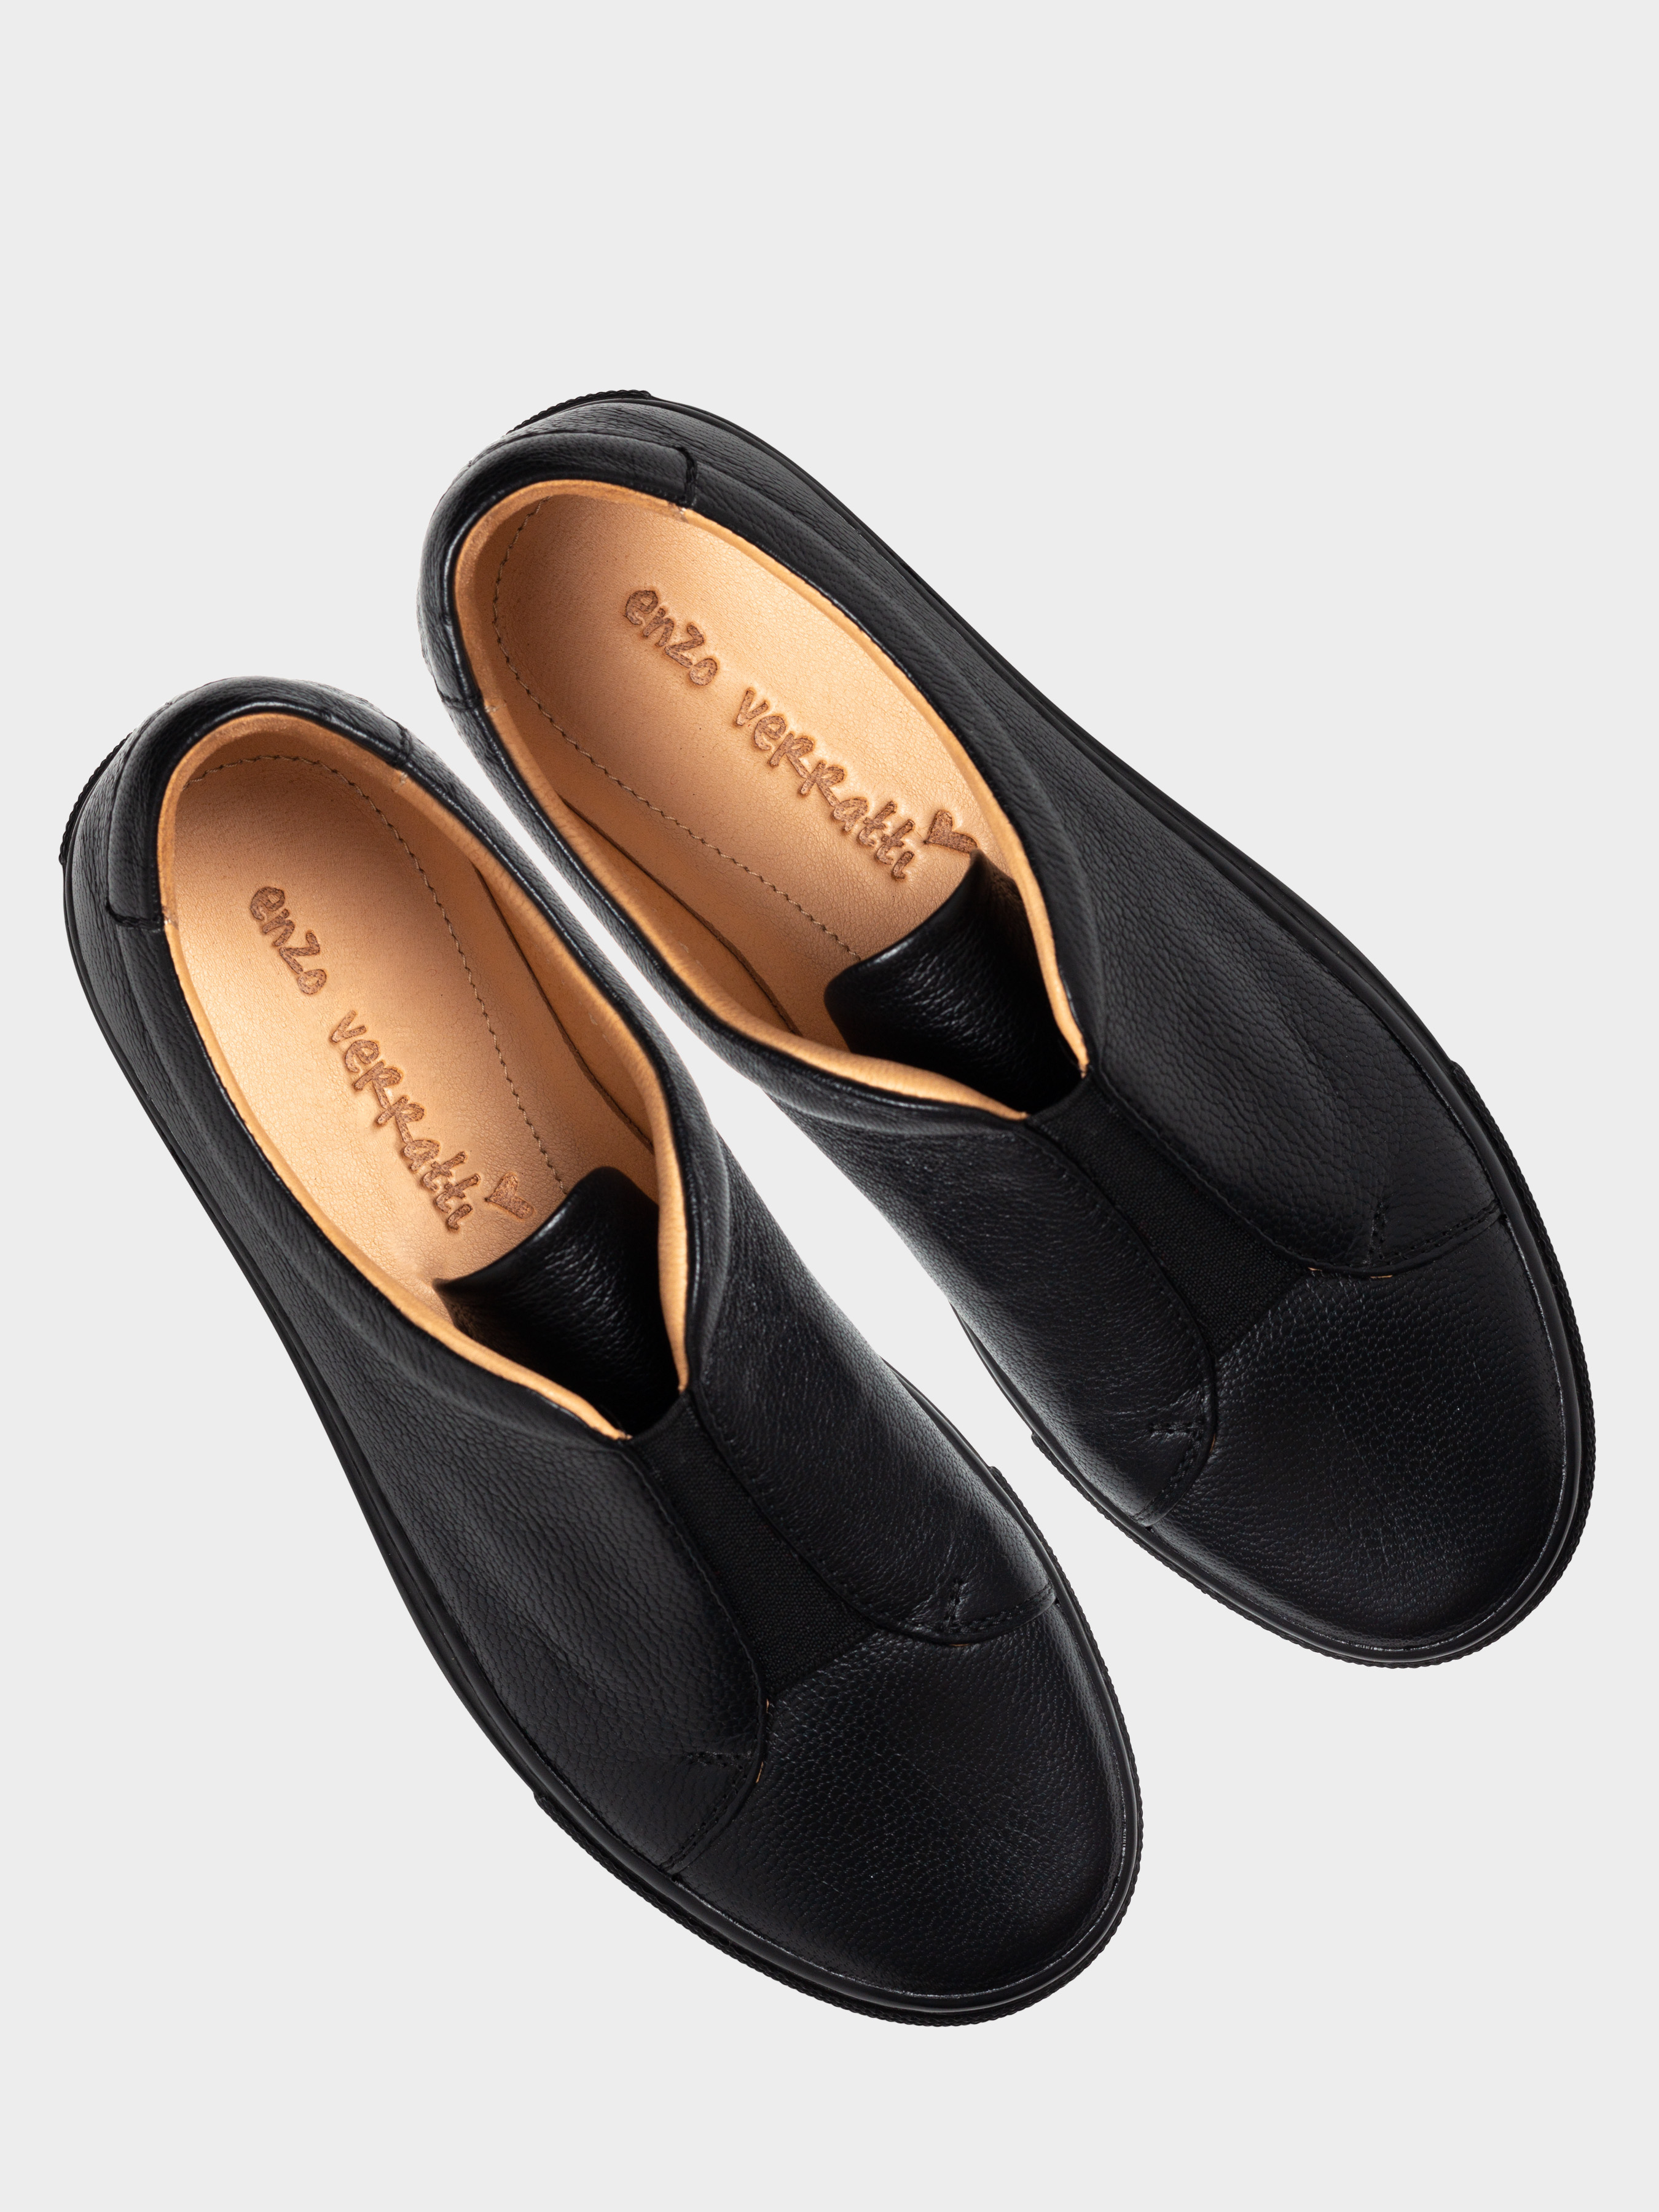 Кеды для женщин Туфли женские ENZO VERRATTI 18-1426-11bl цена, 2017